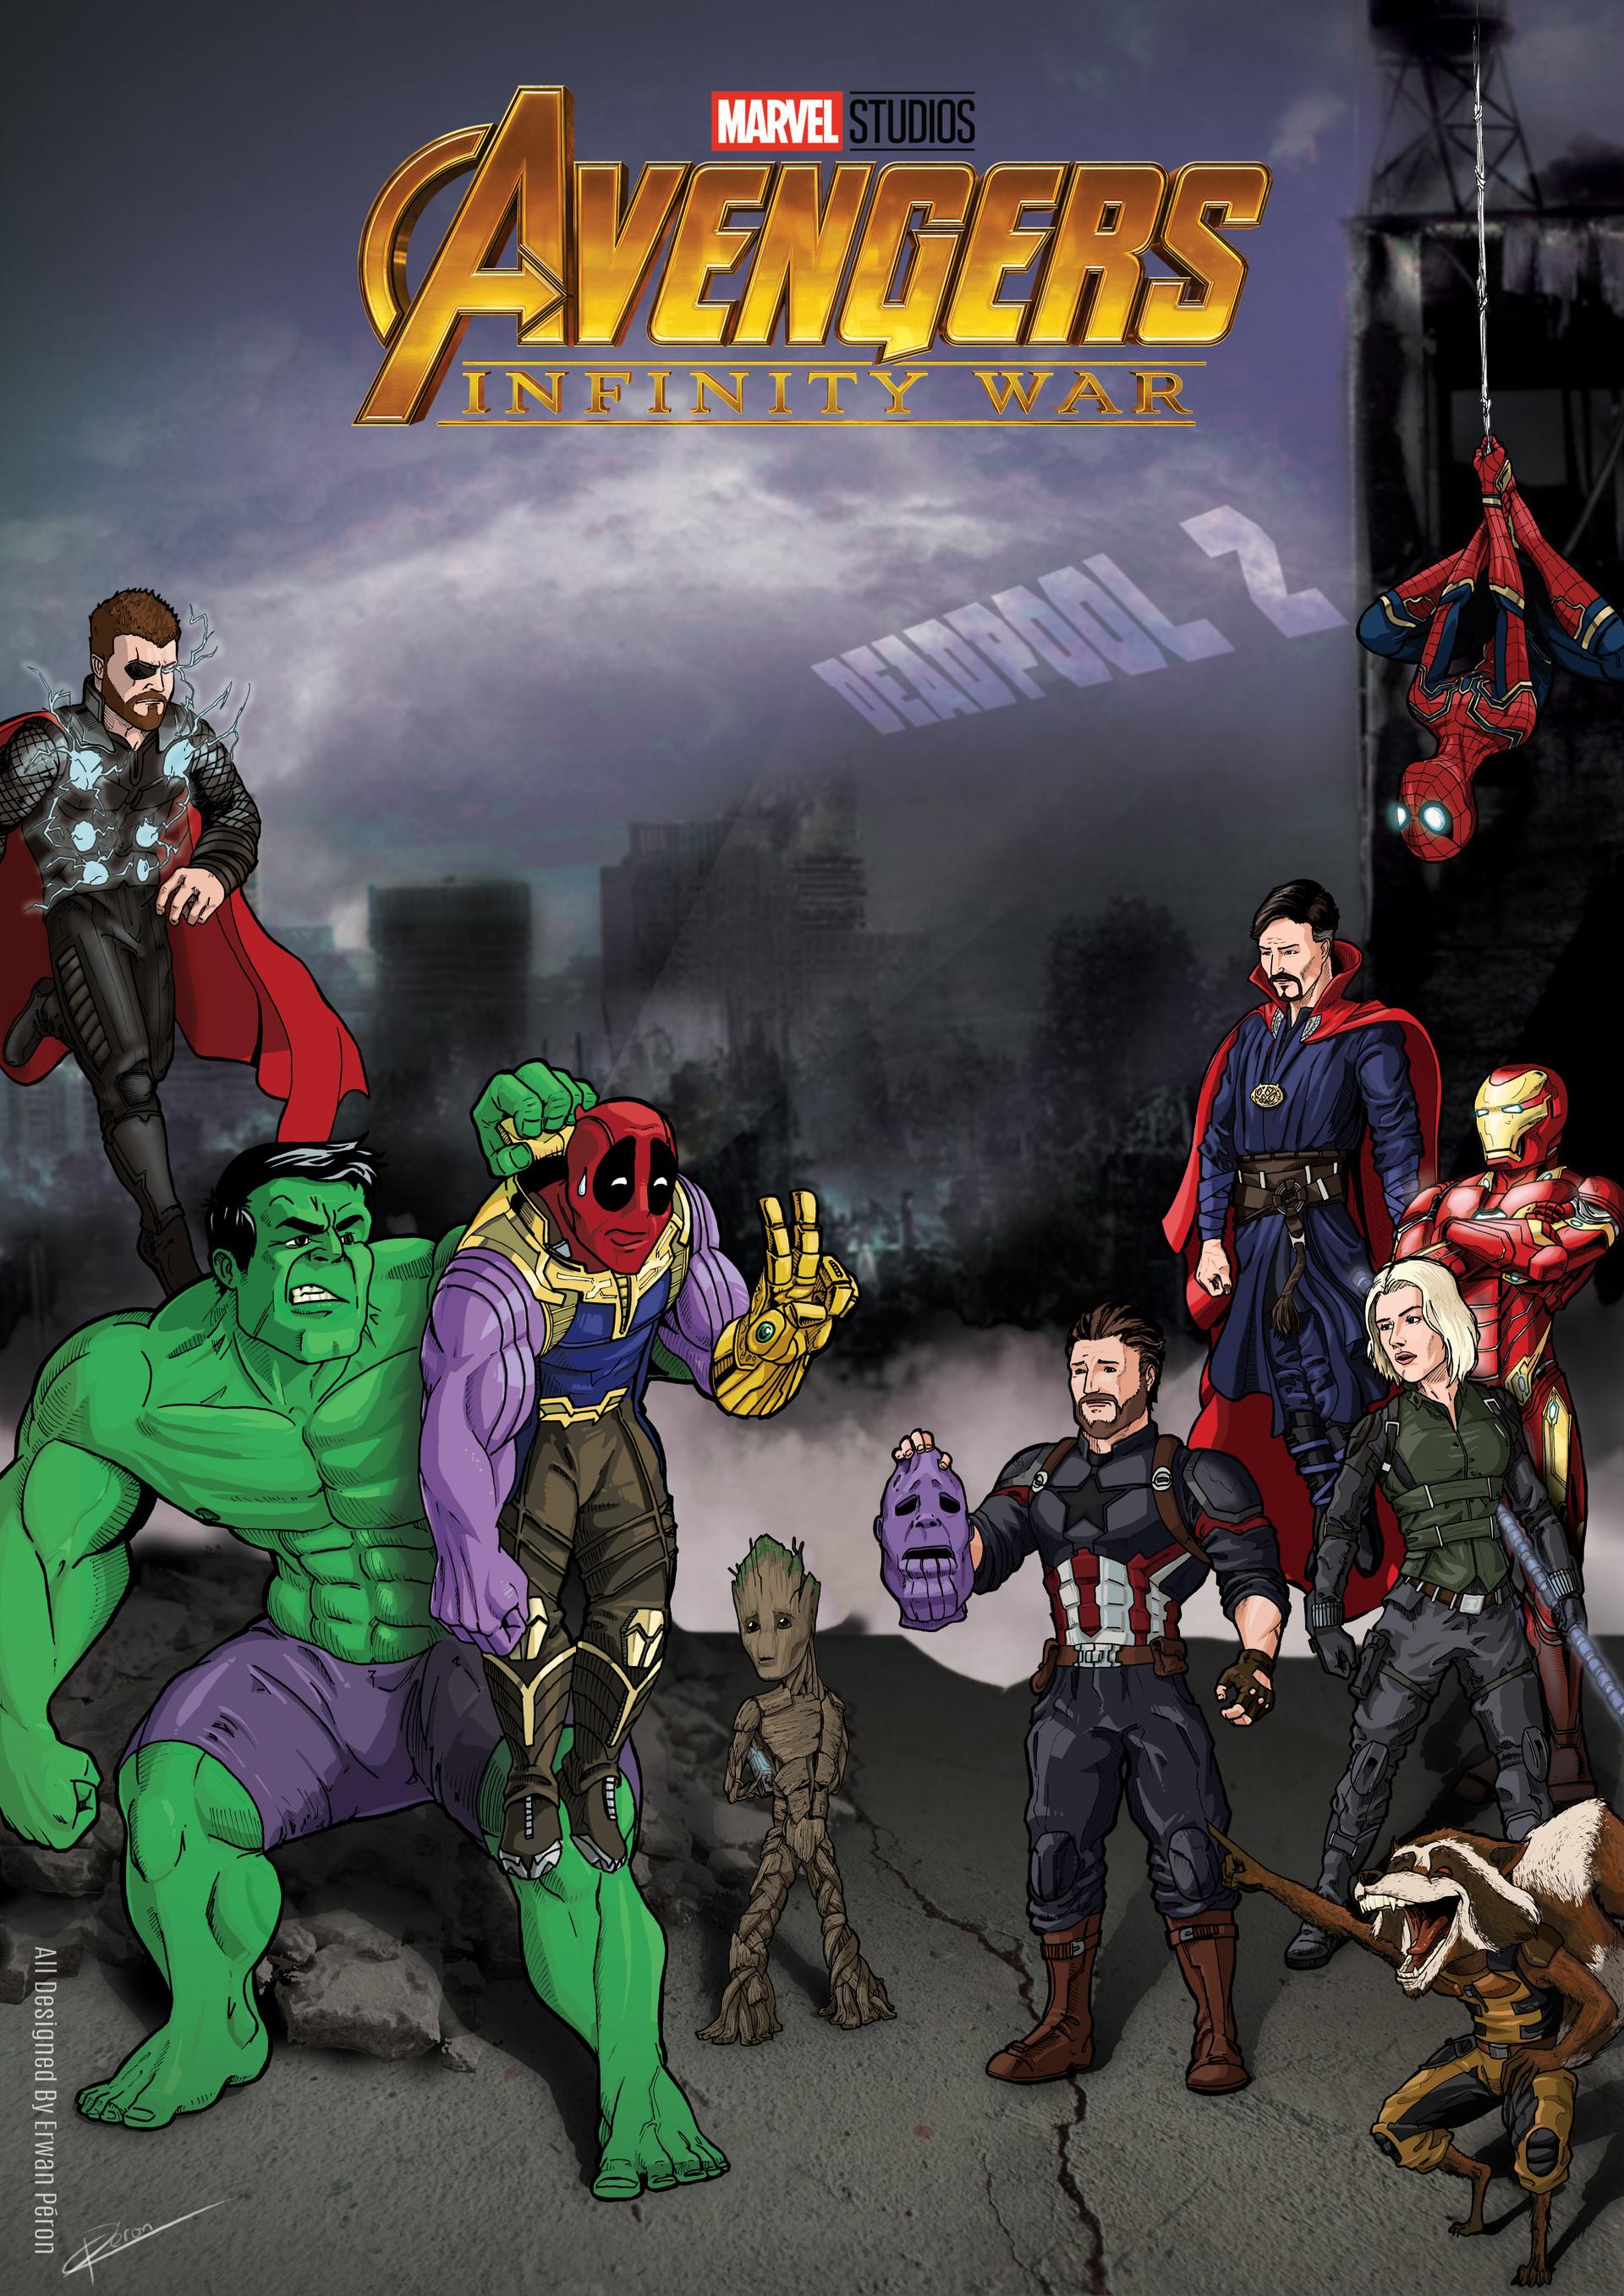 Erwan Peron Poster For The Avenger Infinity War And Deadpool 2